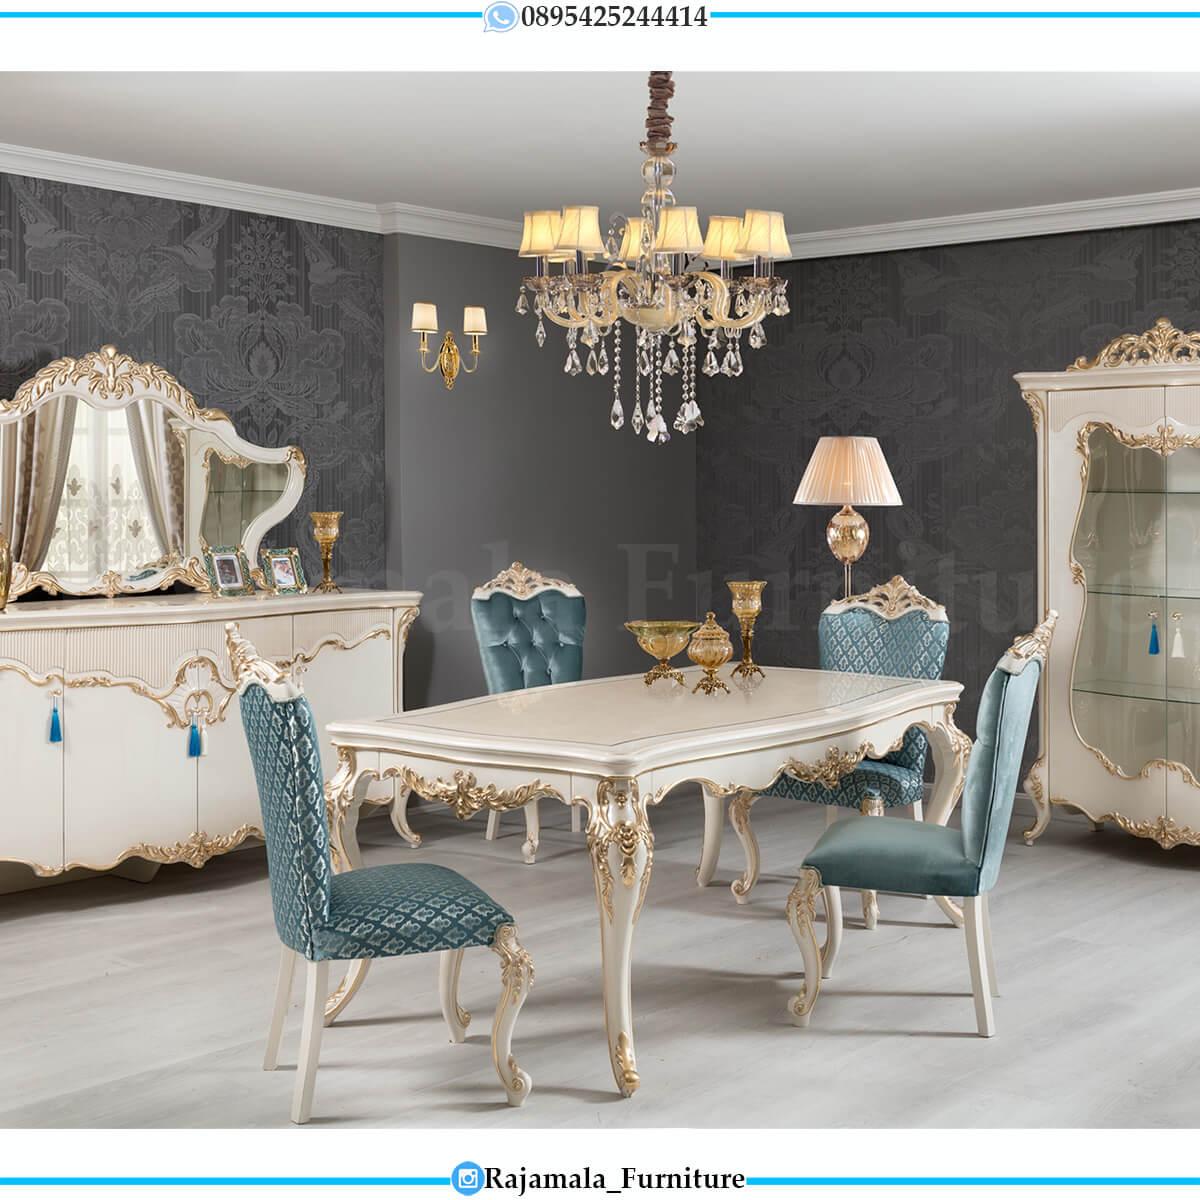 Best Sale Meja Makan Mewah Terbaru Classic Luxury Furniture Jepara RM-0599